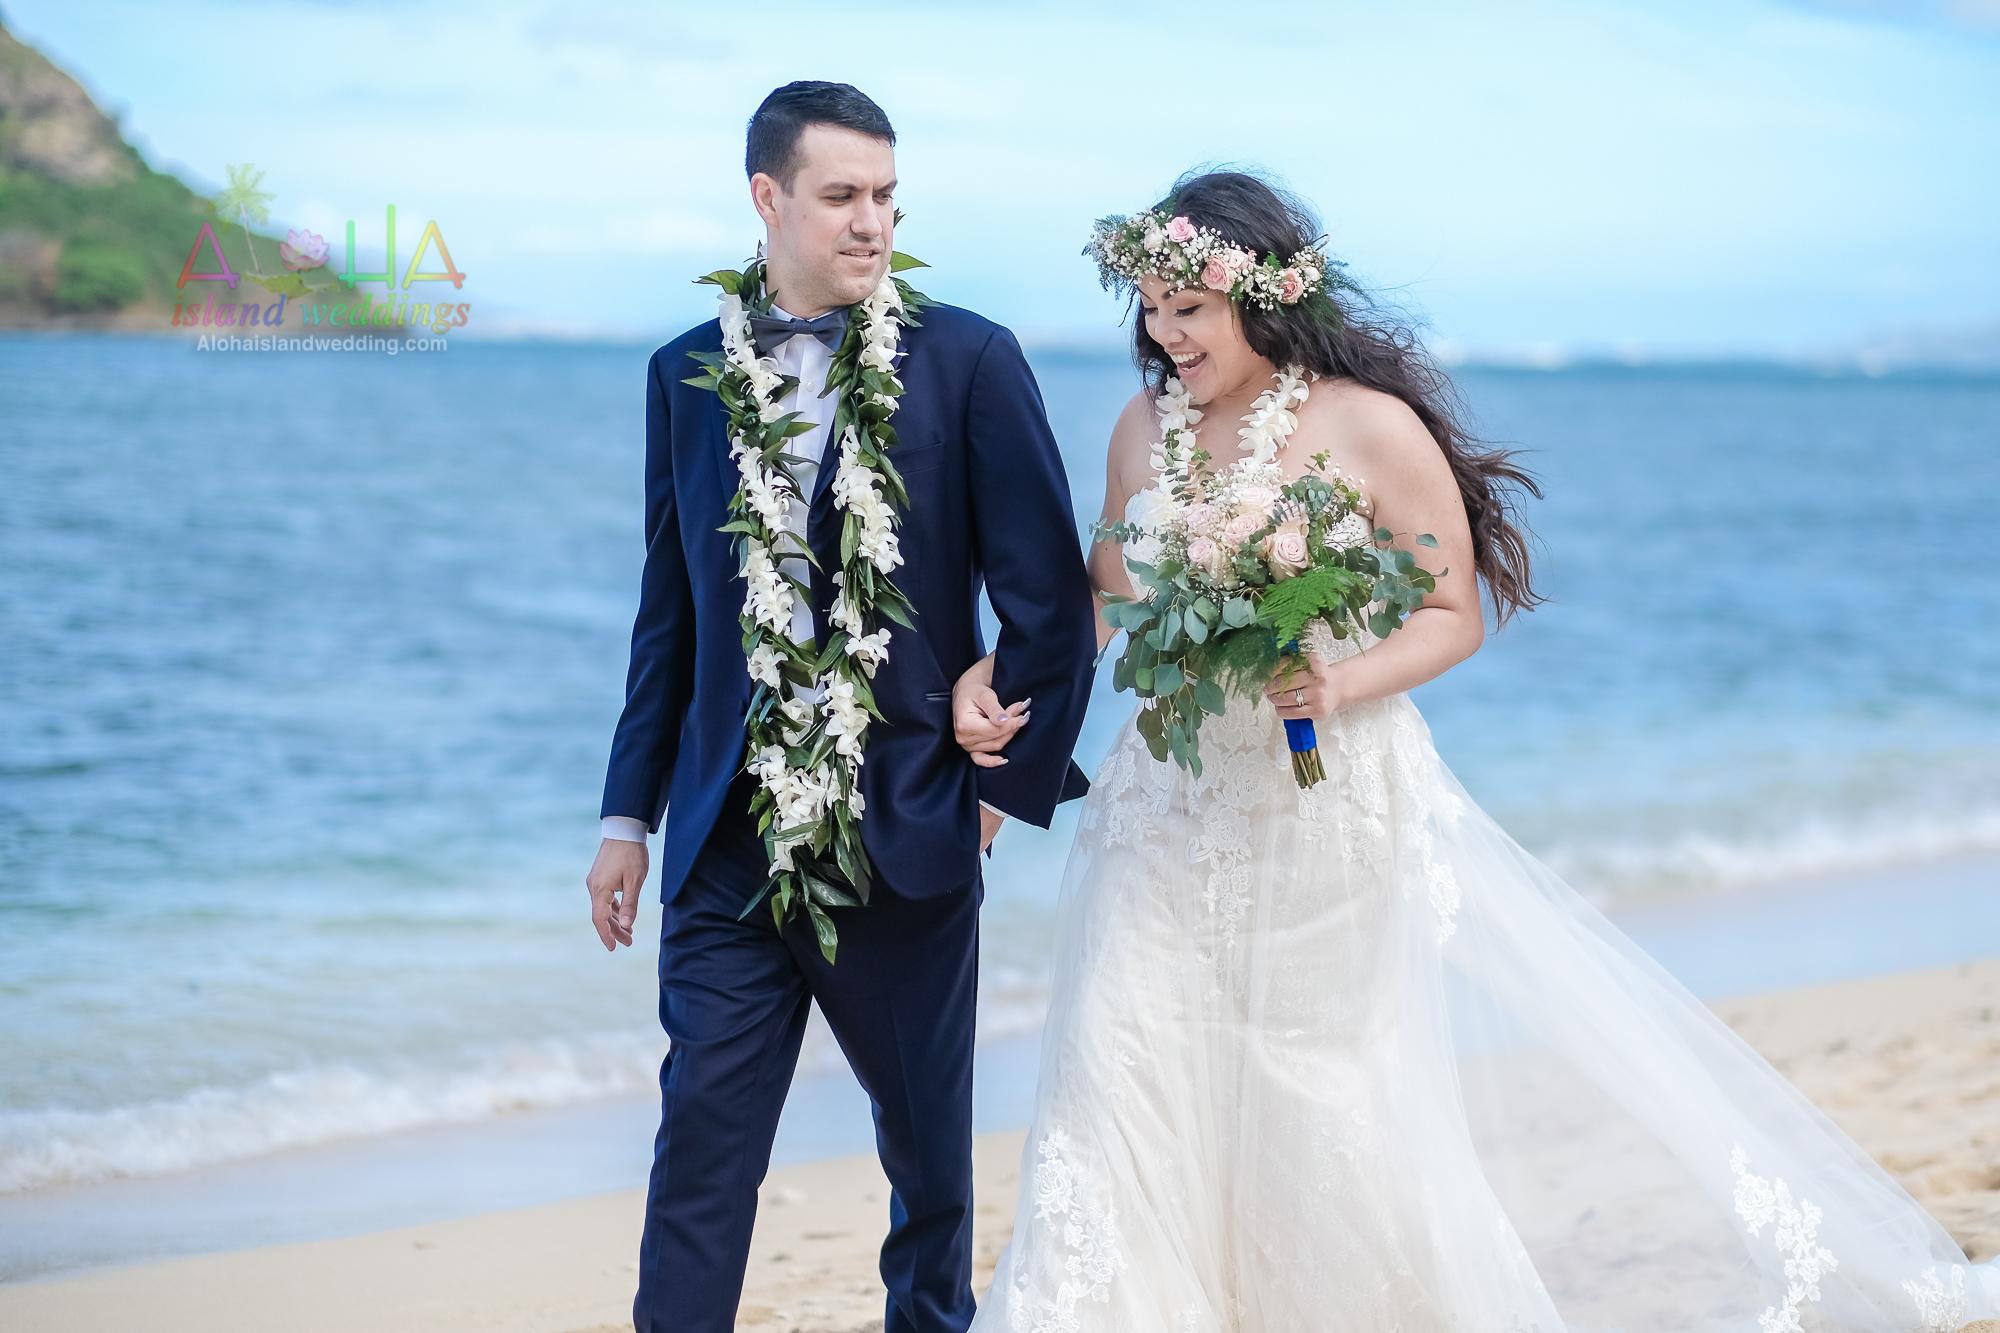 Hawaii weddings and events, Kualoa-28